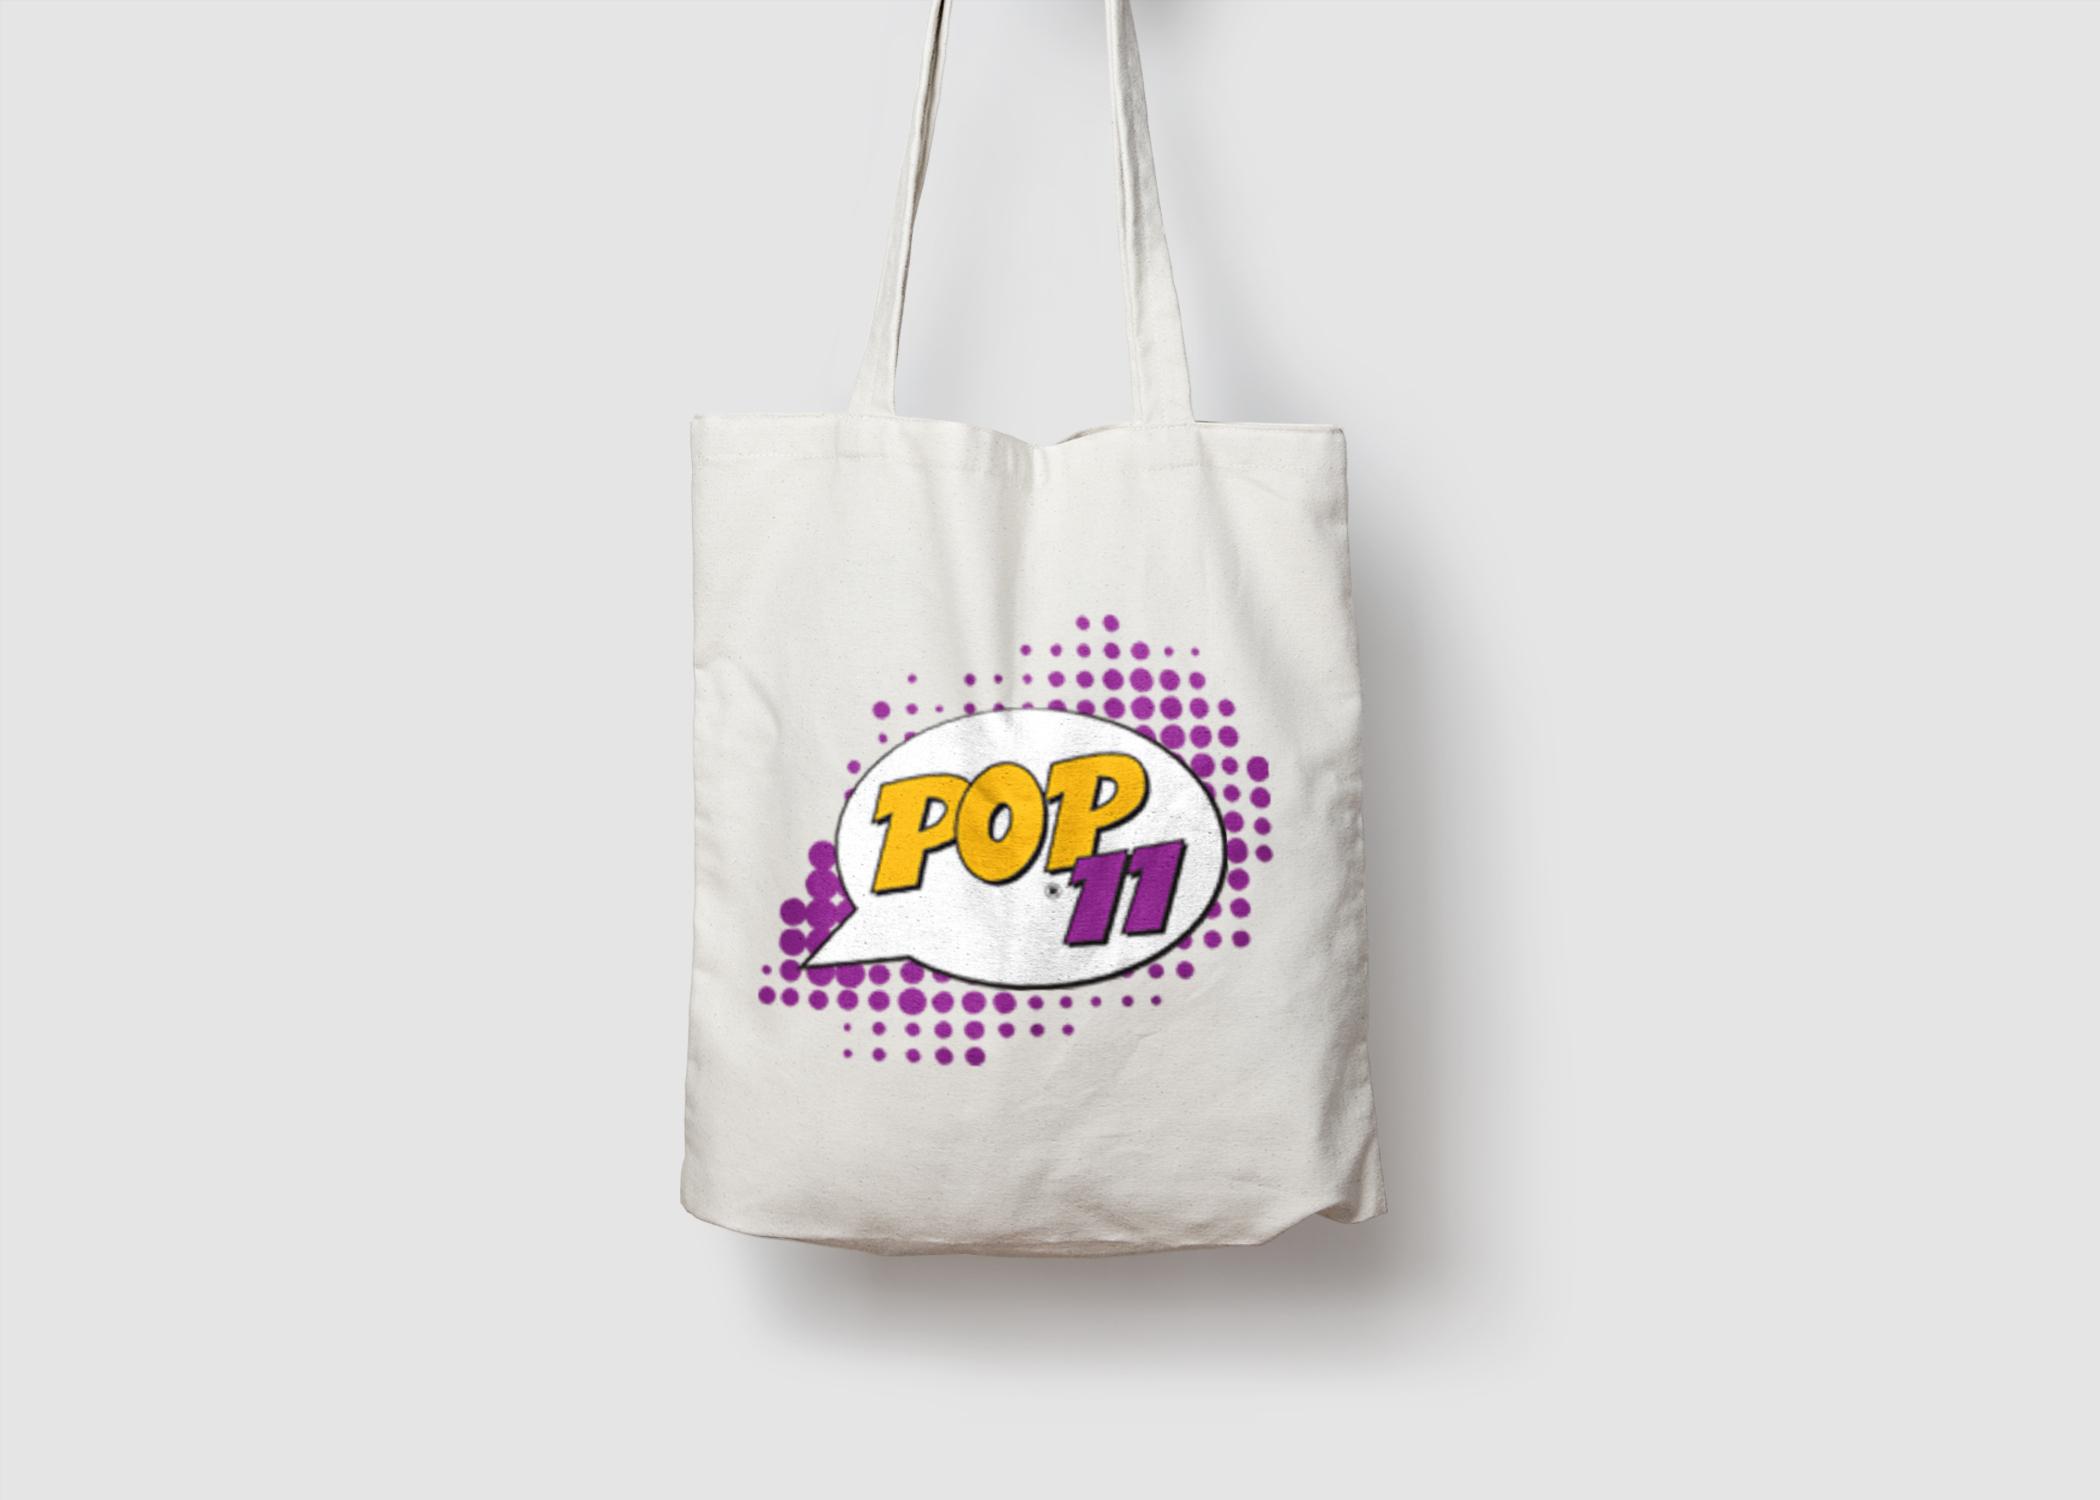 04 Canvas Shopping Bag Pop11 Digital Prints